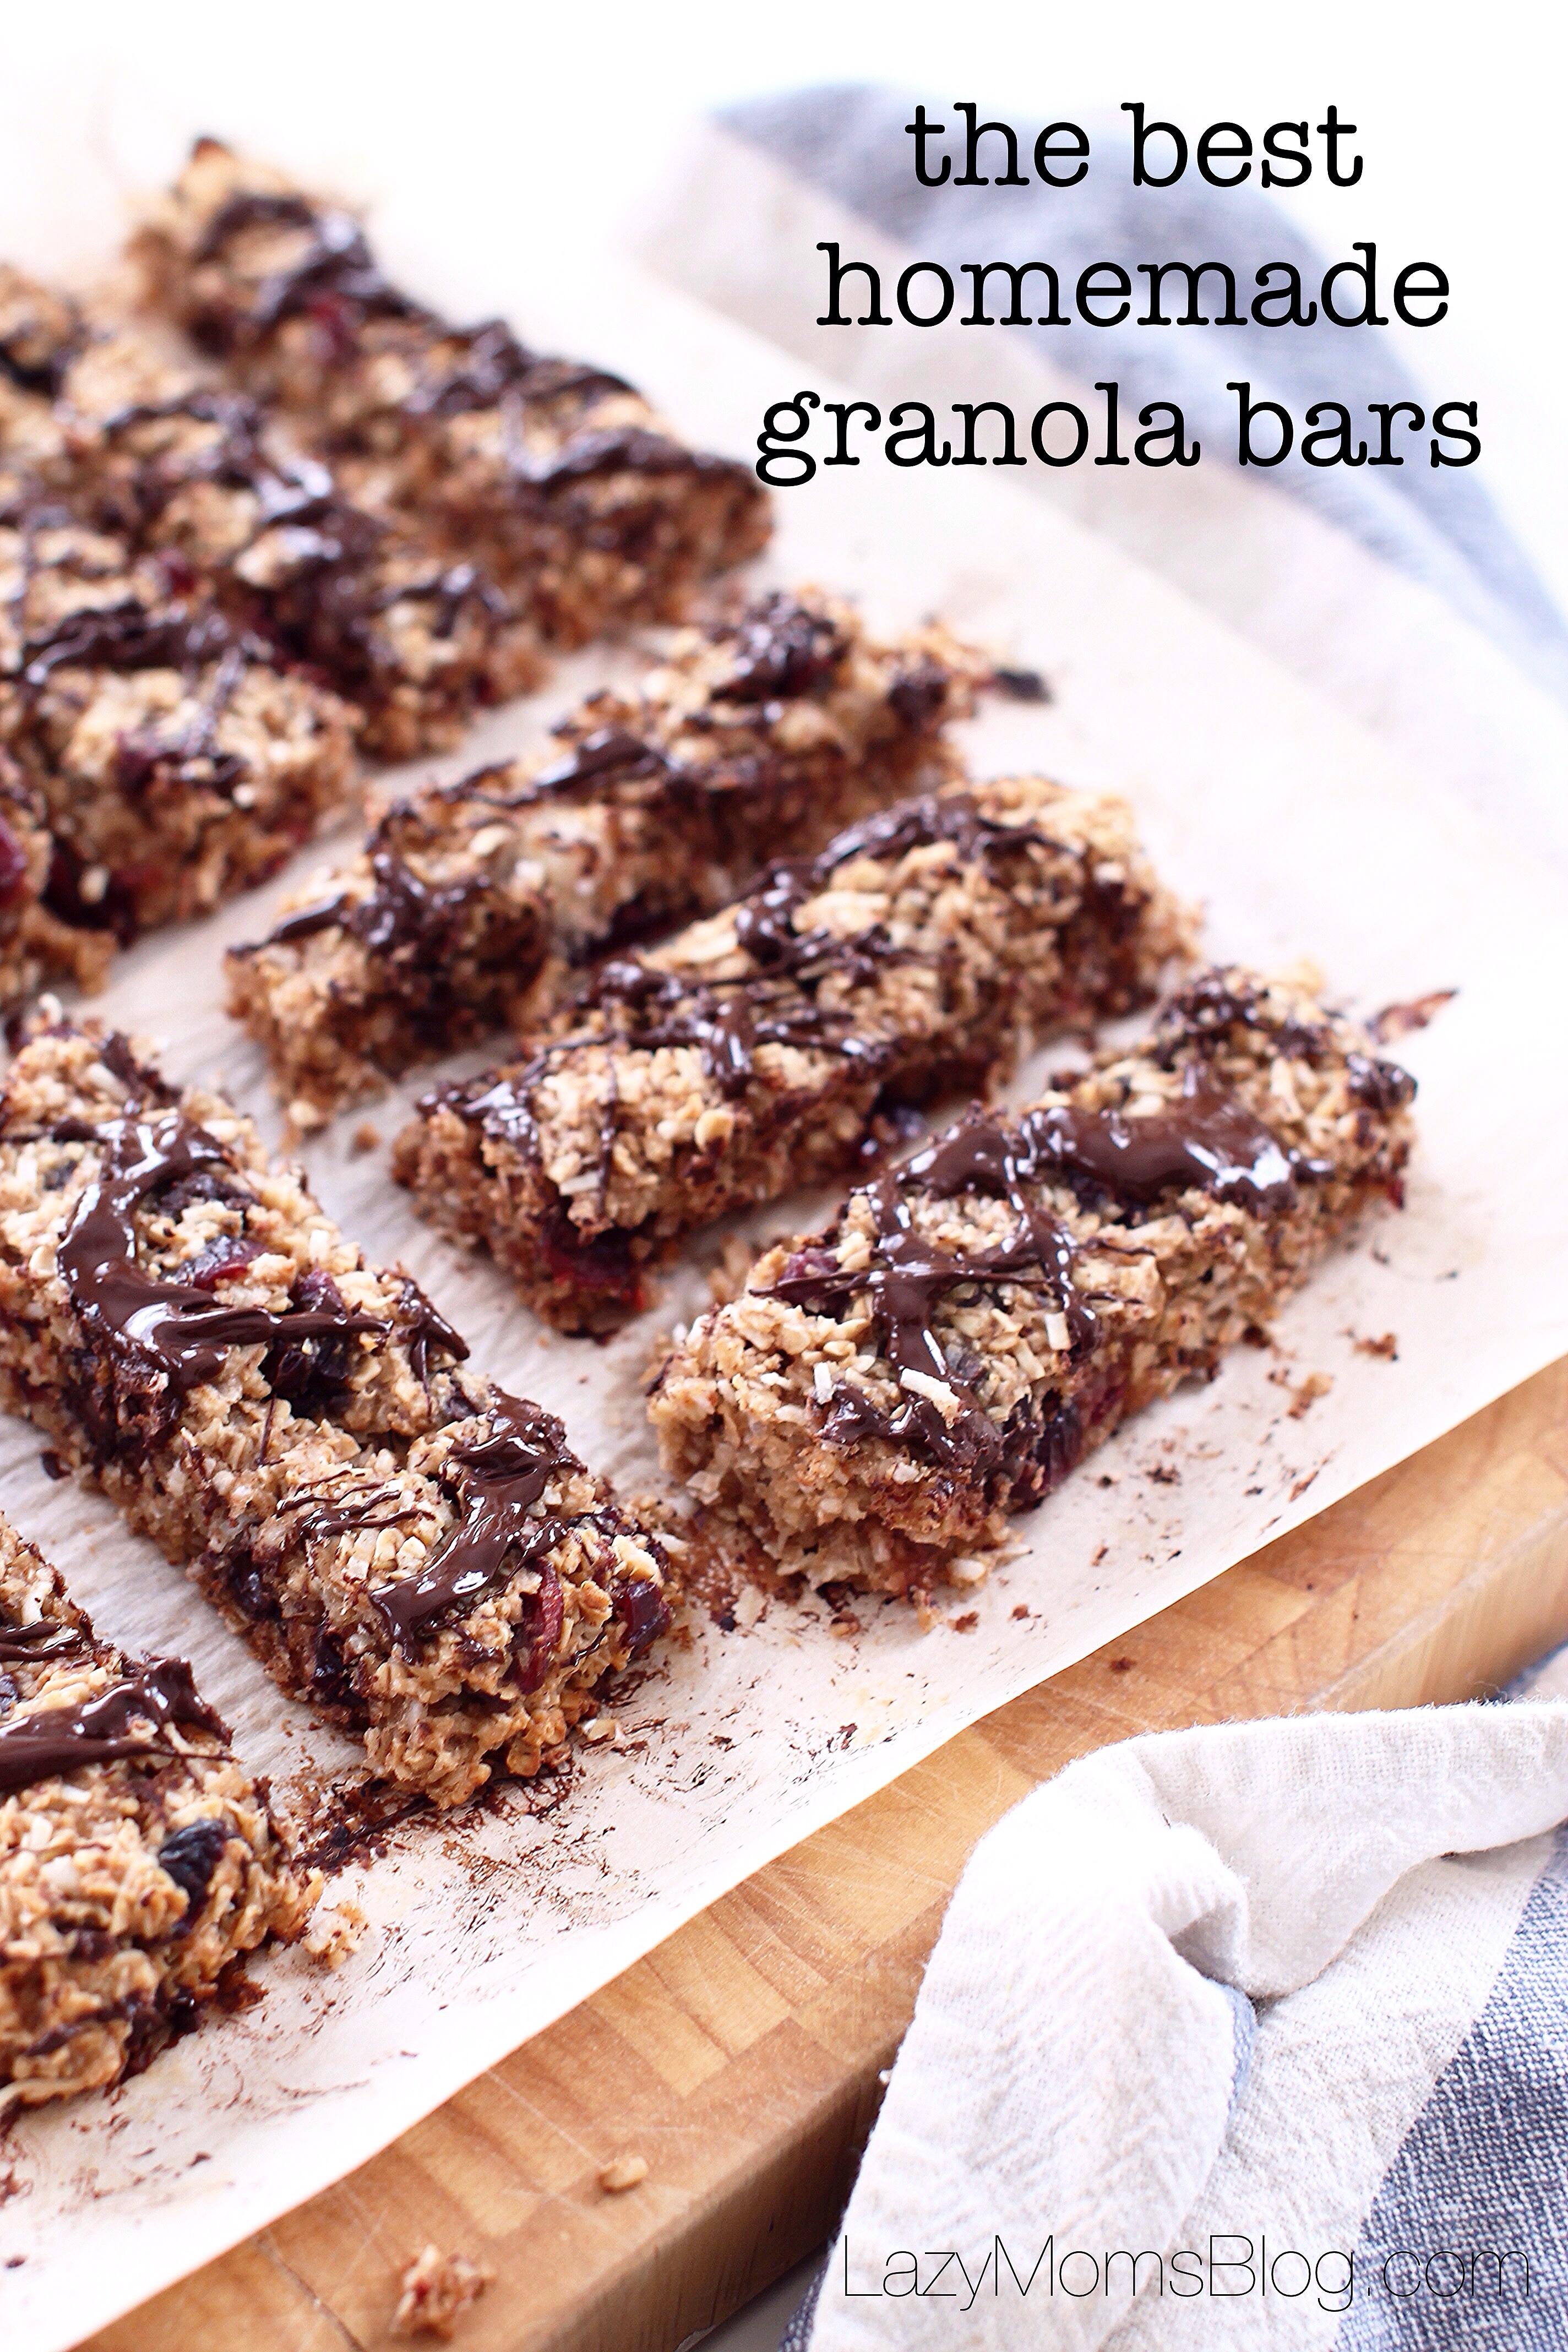 The best homemade granola bars - Lazy Mom's blog